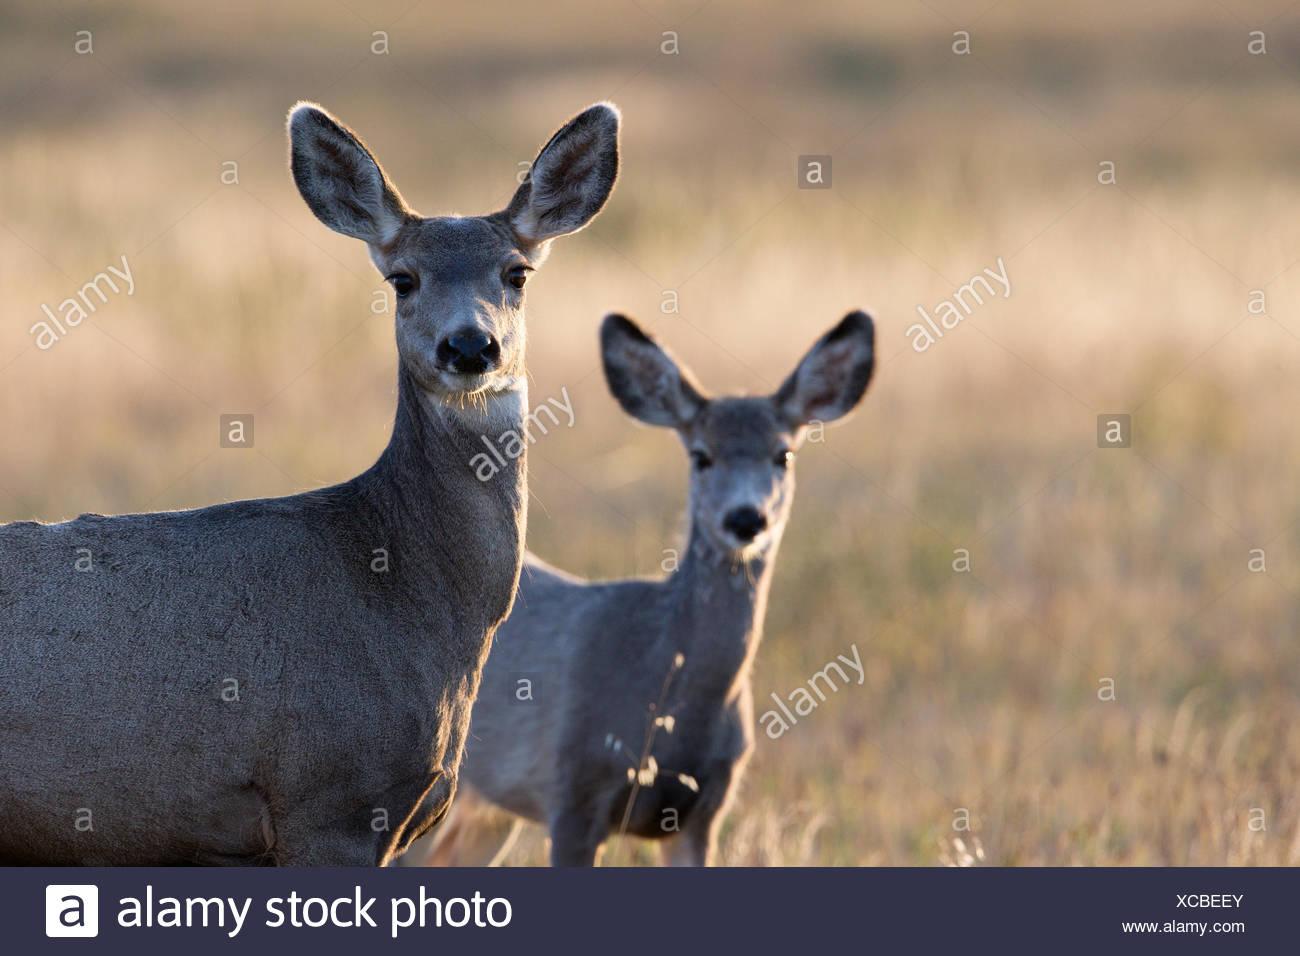 Mule deer (Odocoileus hemionus), doe and fawn, Grasslands National Park, Saskatchewan. - Stock Image